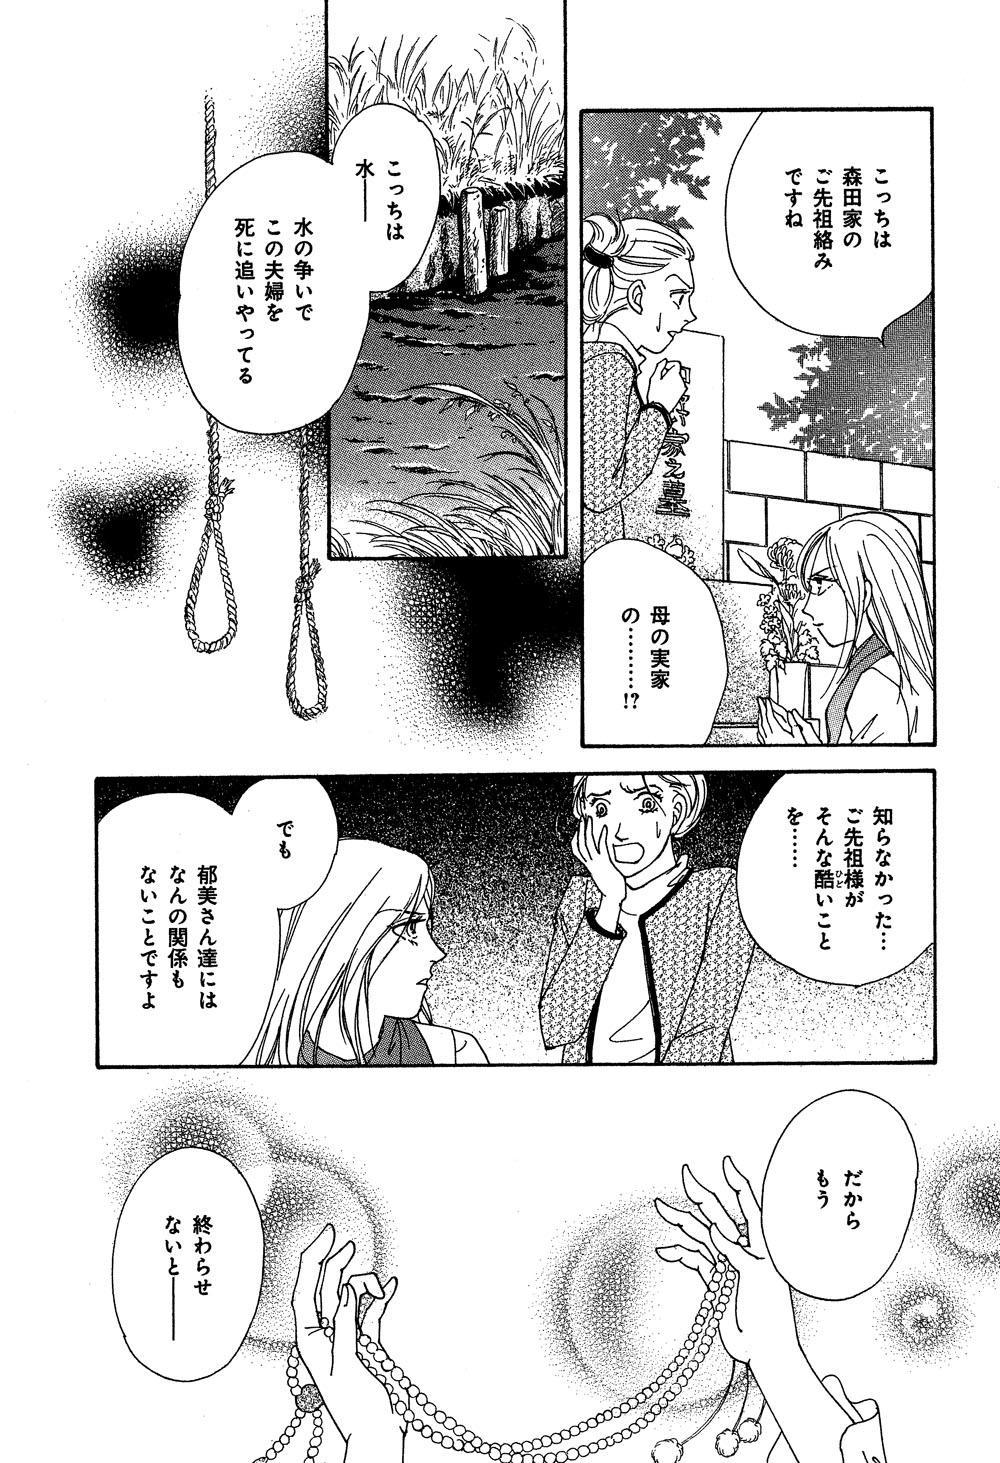 mayuri_0001_0156.jpg